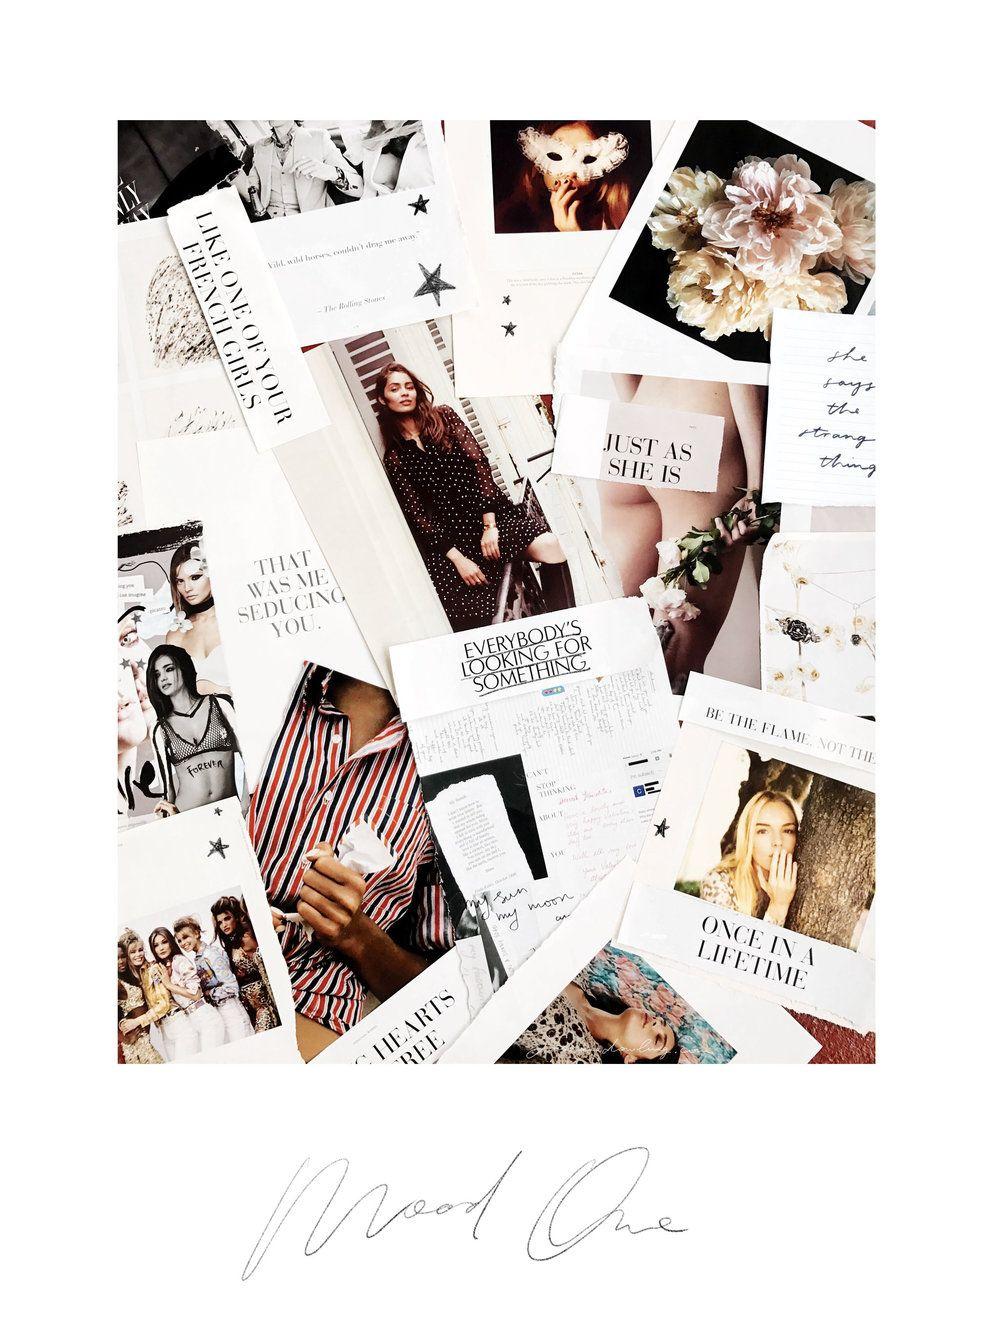 MOOD ONE — Jasmine Dowling